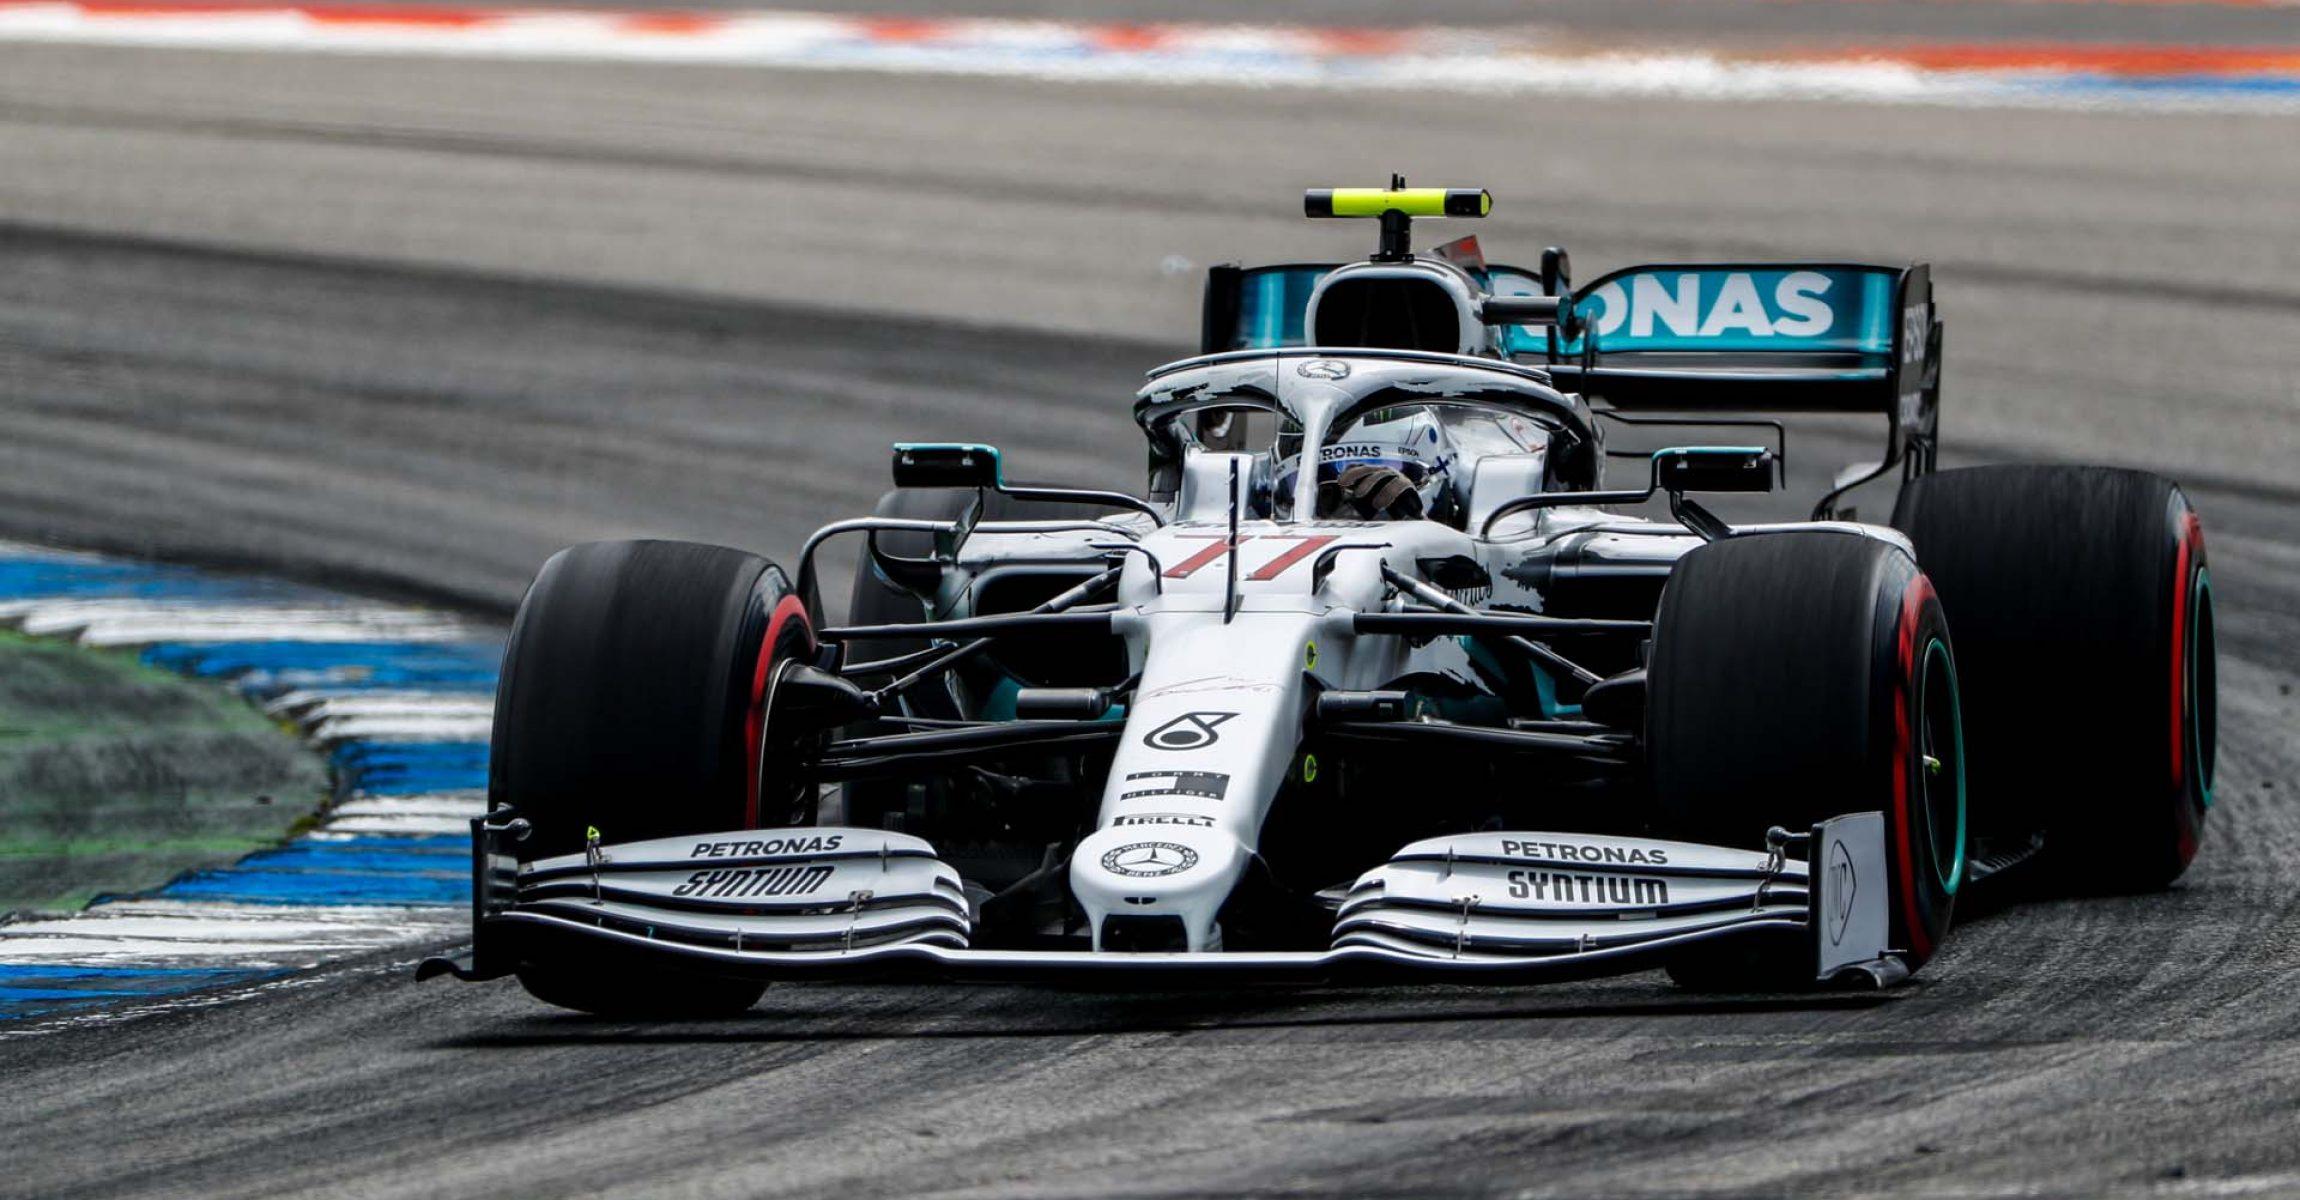 2019 German Grand Prix, Saturday - LAT Images Valtteri Bottas Mercedes